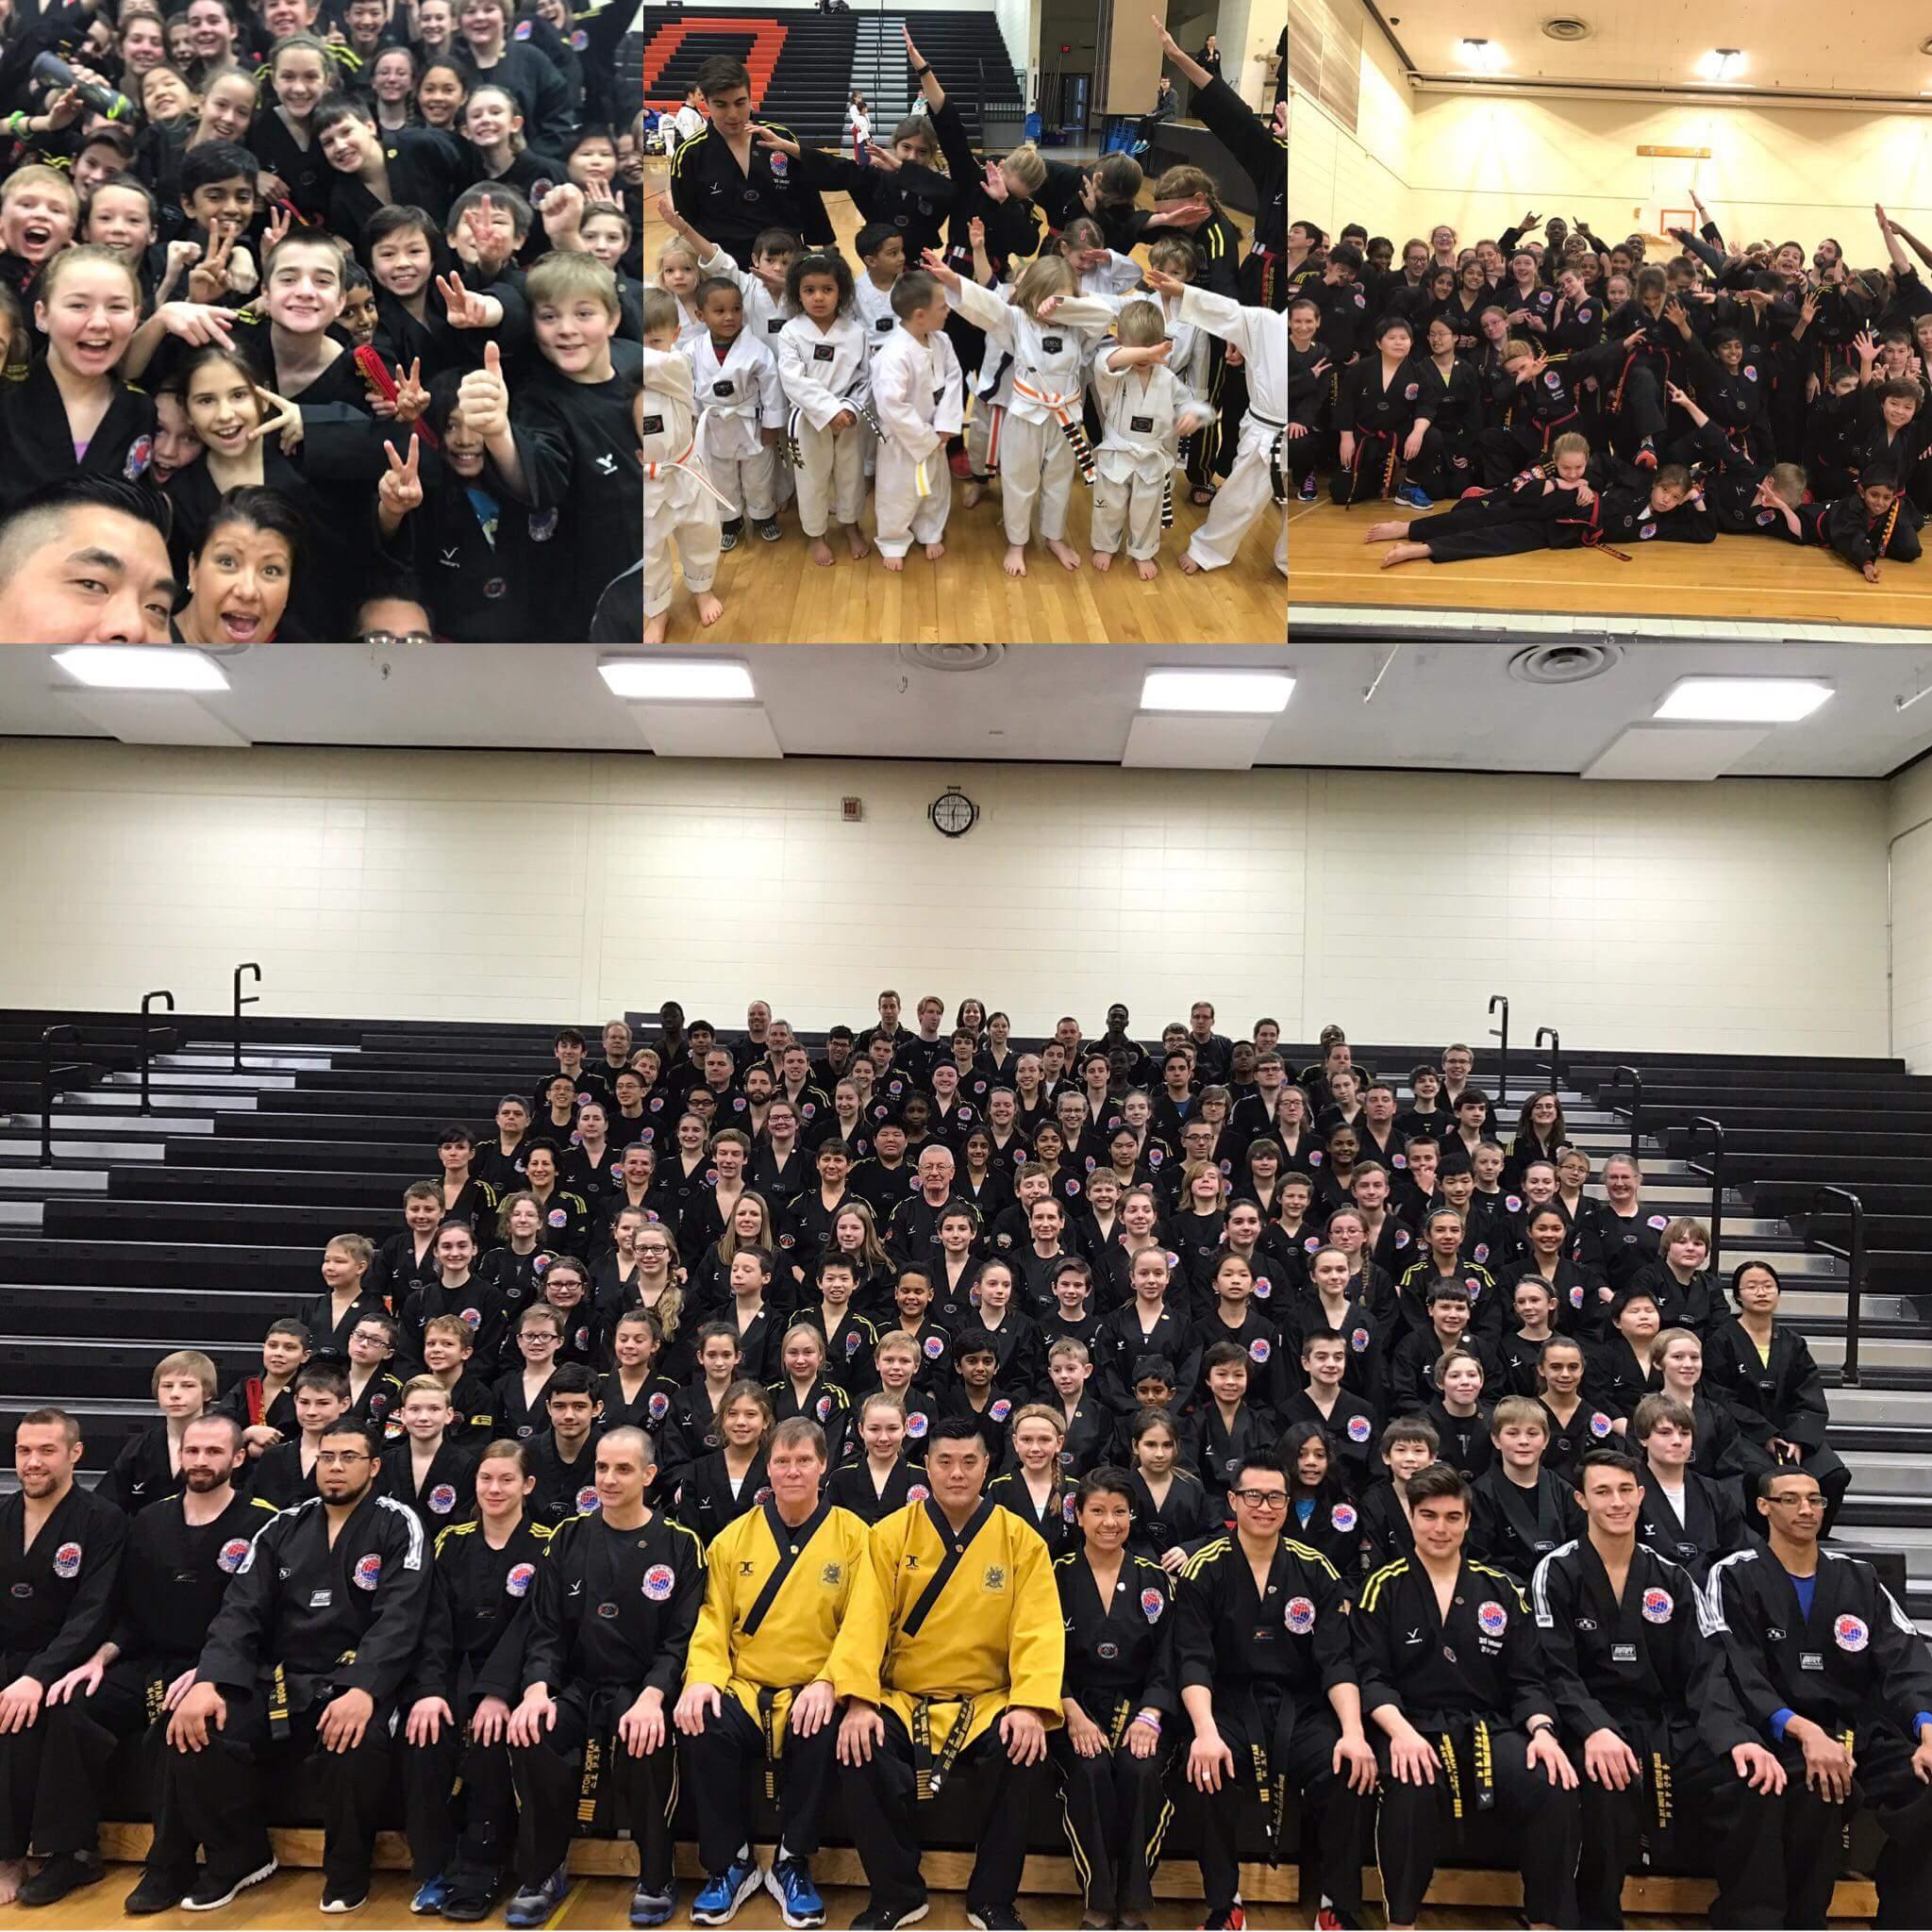 World Taekwondo Academy